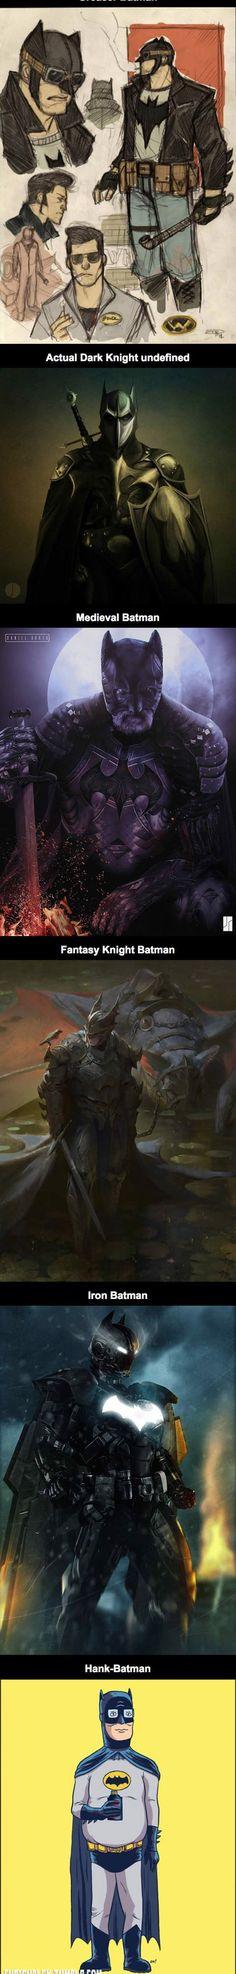 « Fan art » de Batman | 5 Minutes à perdre